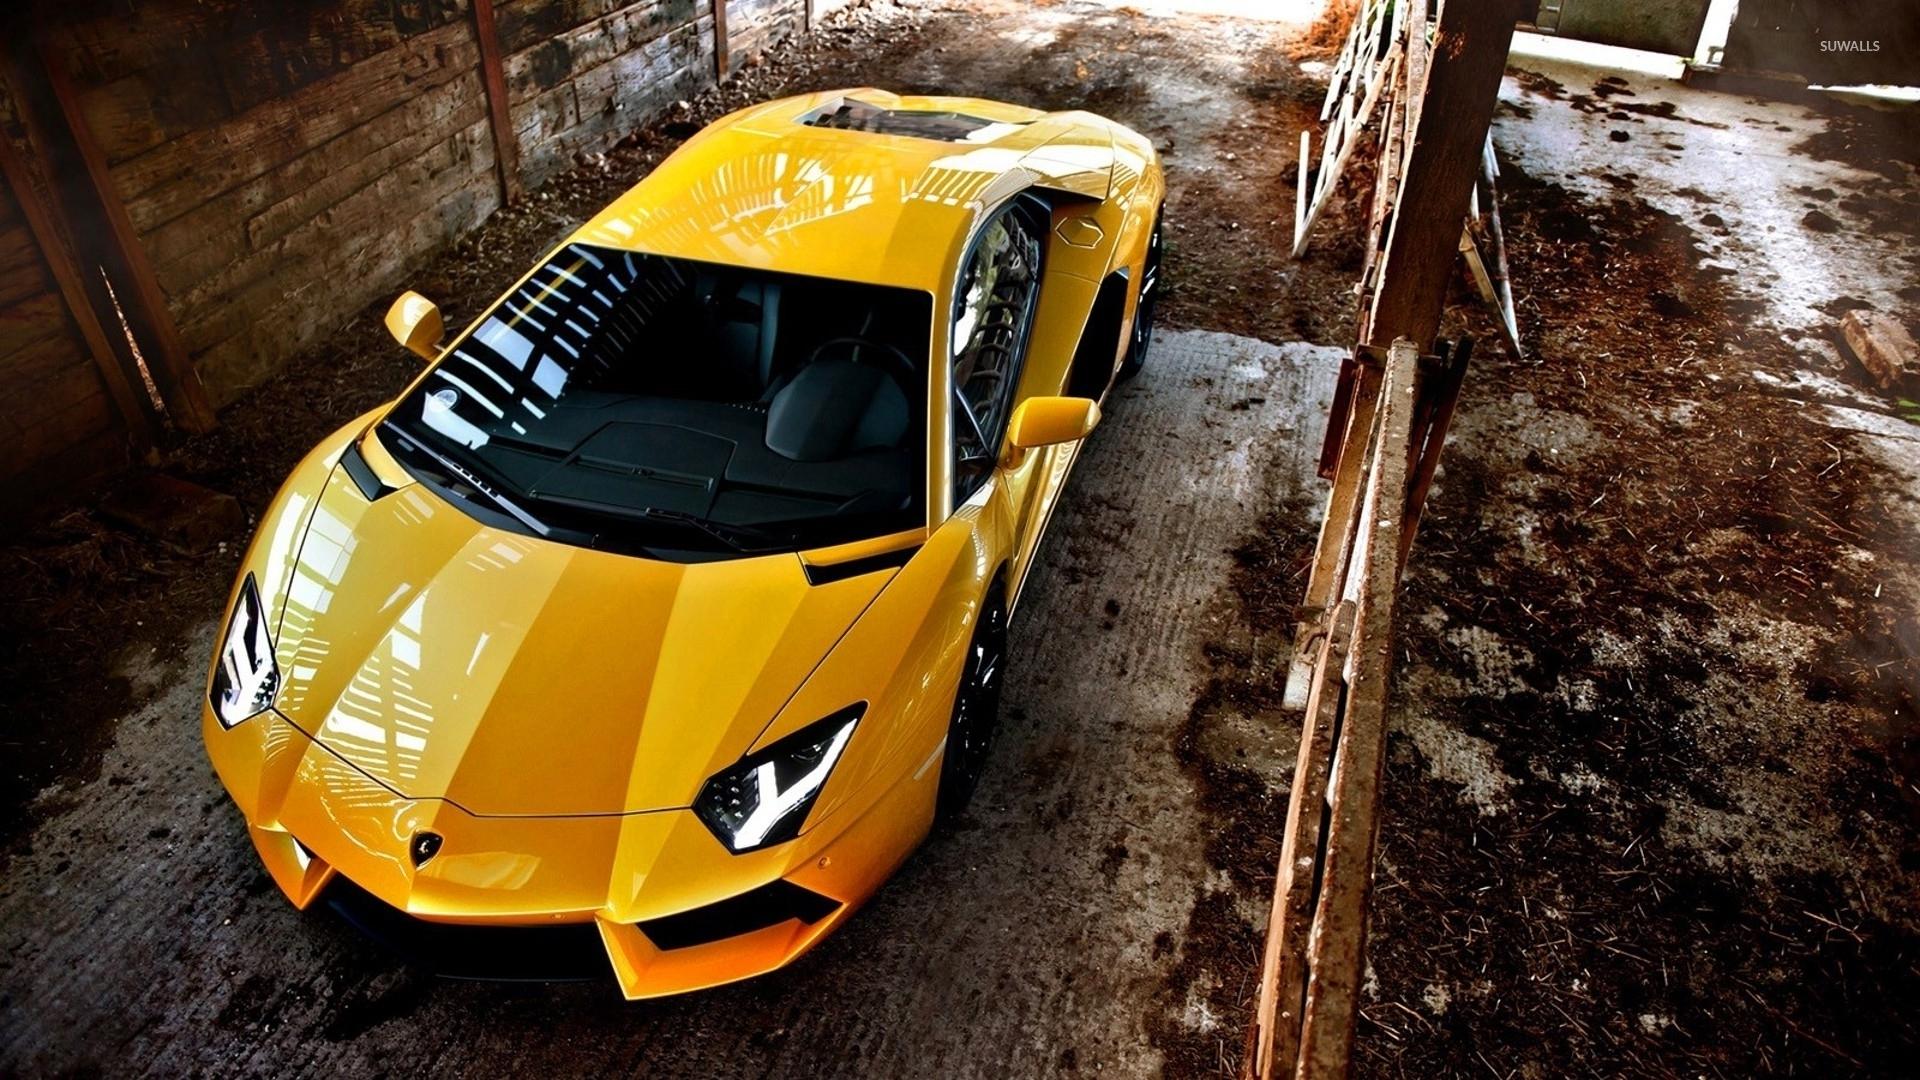 Top View Of A Yellow Lamborghini Aventador Wallpaper